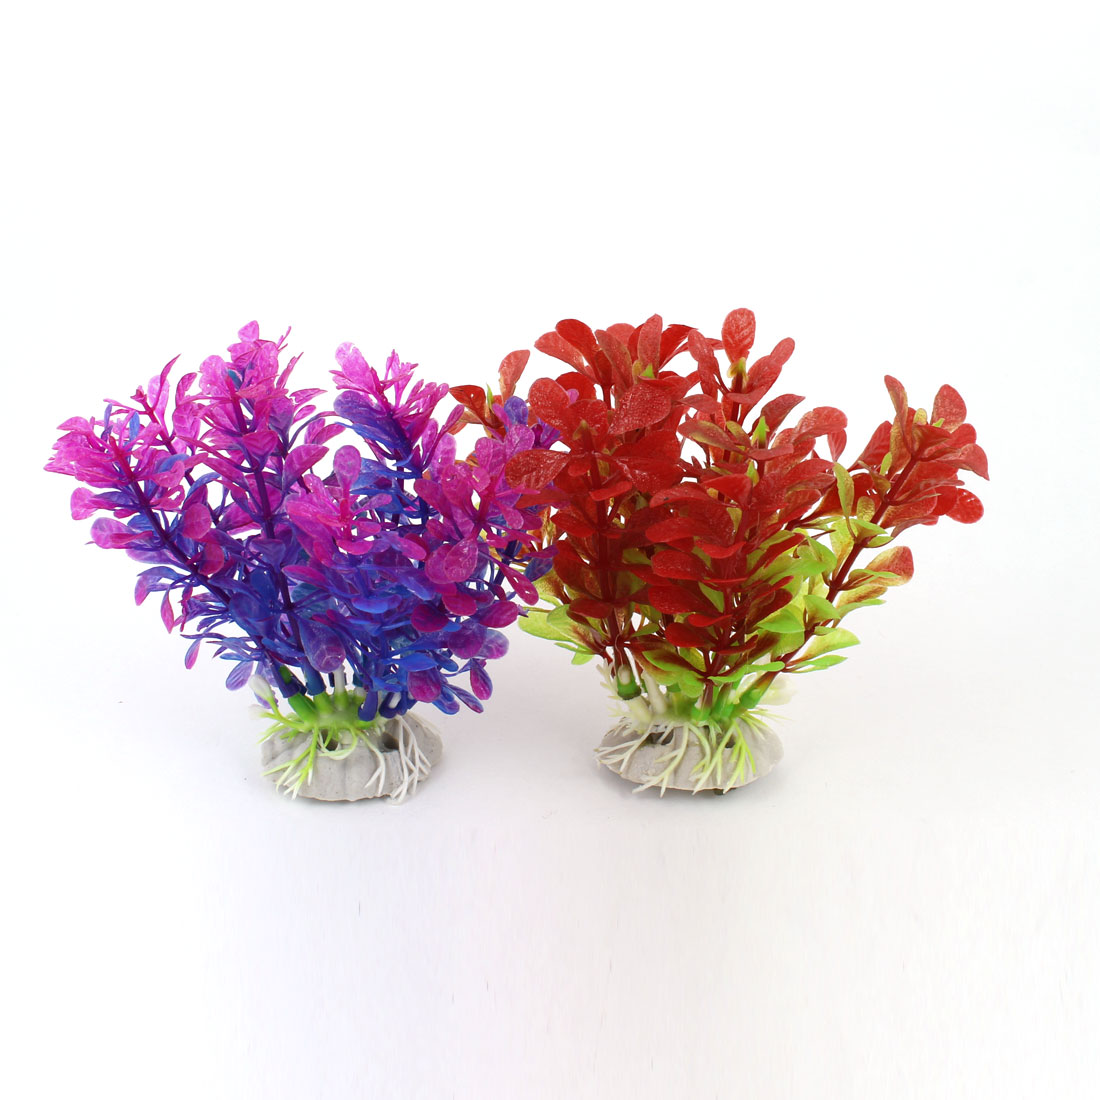 "2 Pcs 4.1"" High Artificial Fish Tank Aquarium Plants Red Fuchsia w Ceramic Base"